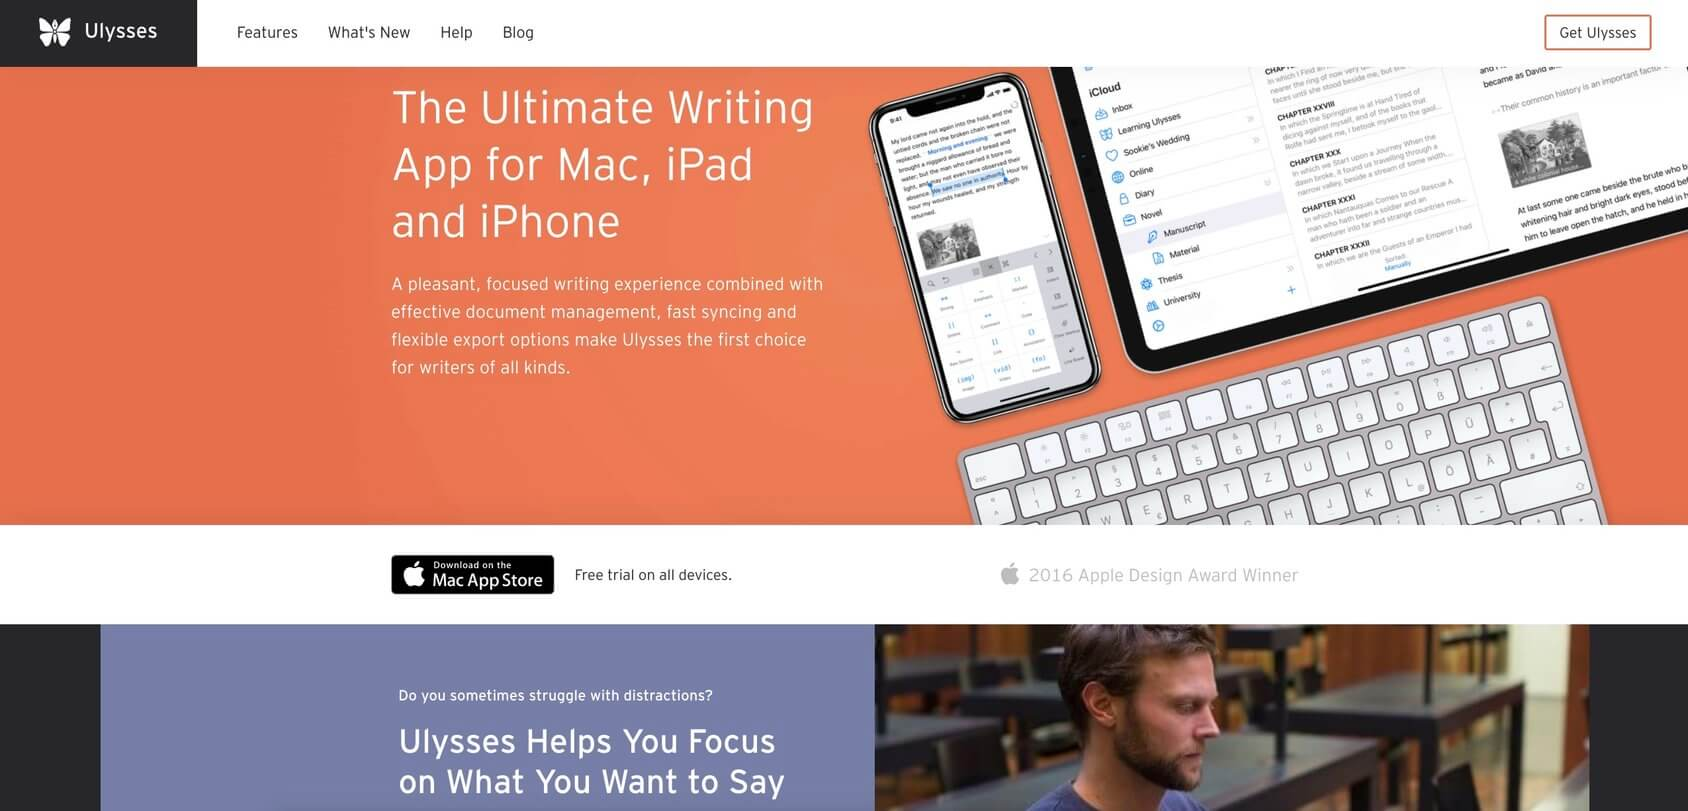 Ulysses homepage